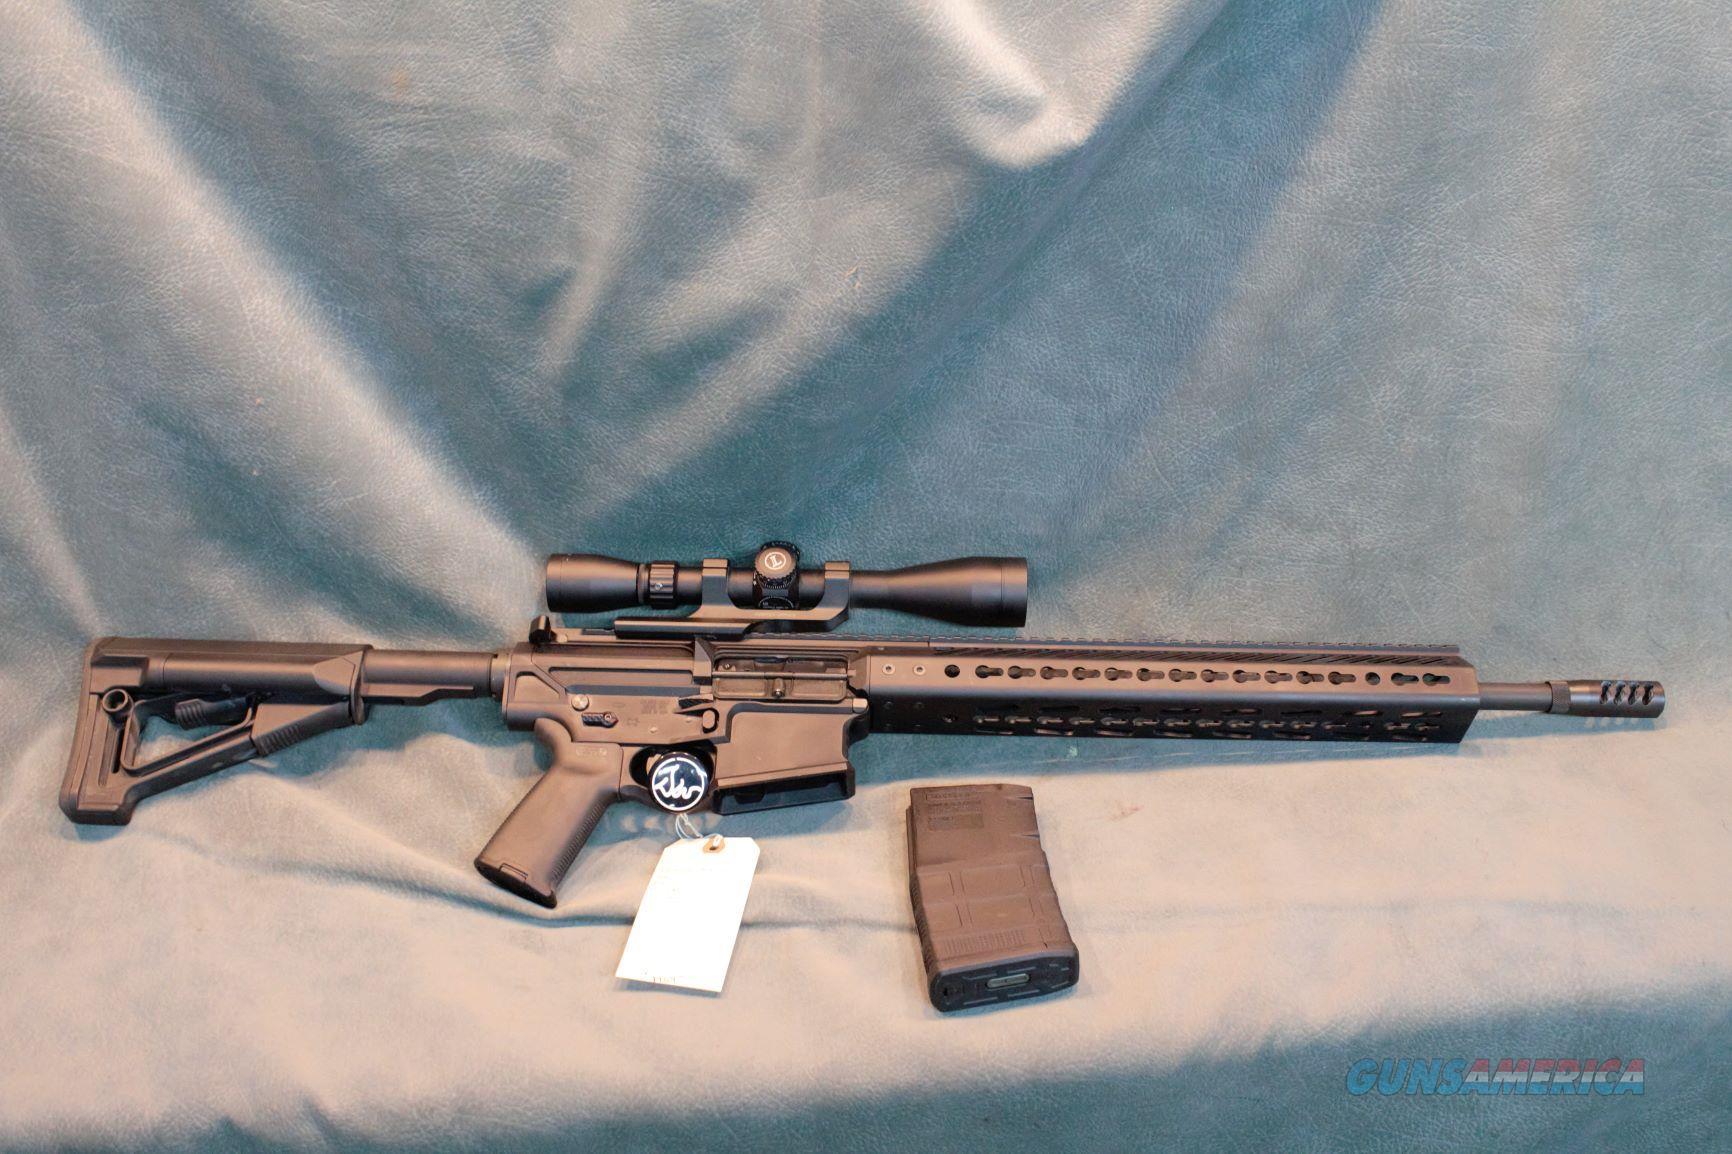 Seekins Precision SPX 308 Win  Guns > Rifles > AR-15 Rifles - Small Manufacturers > Complete Rifle